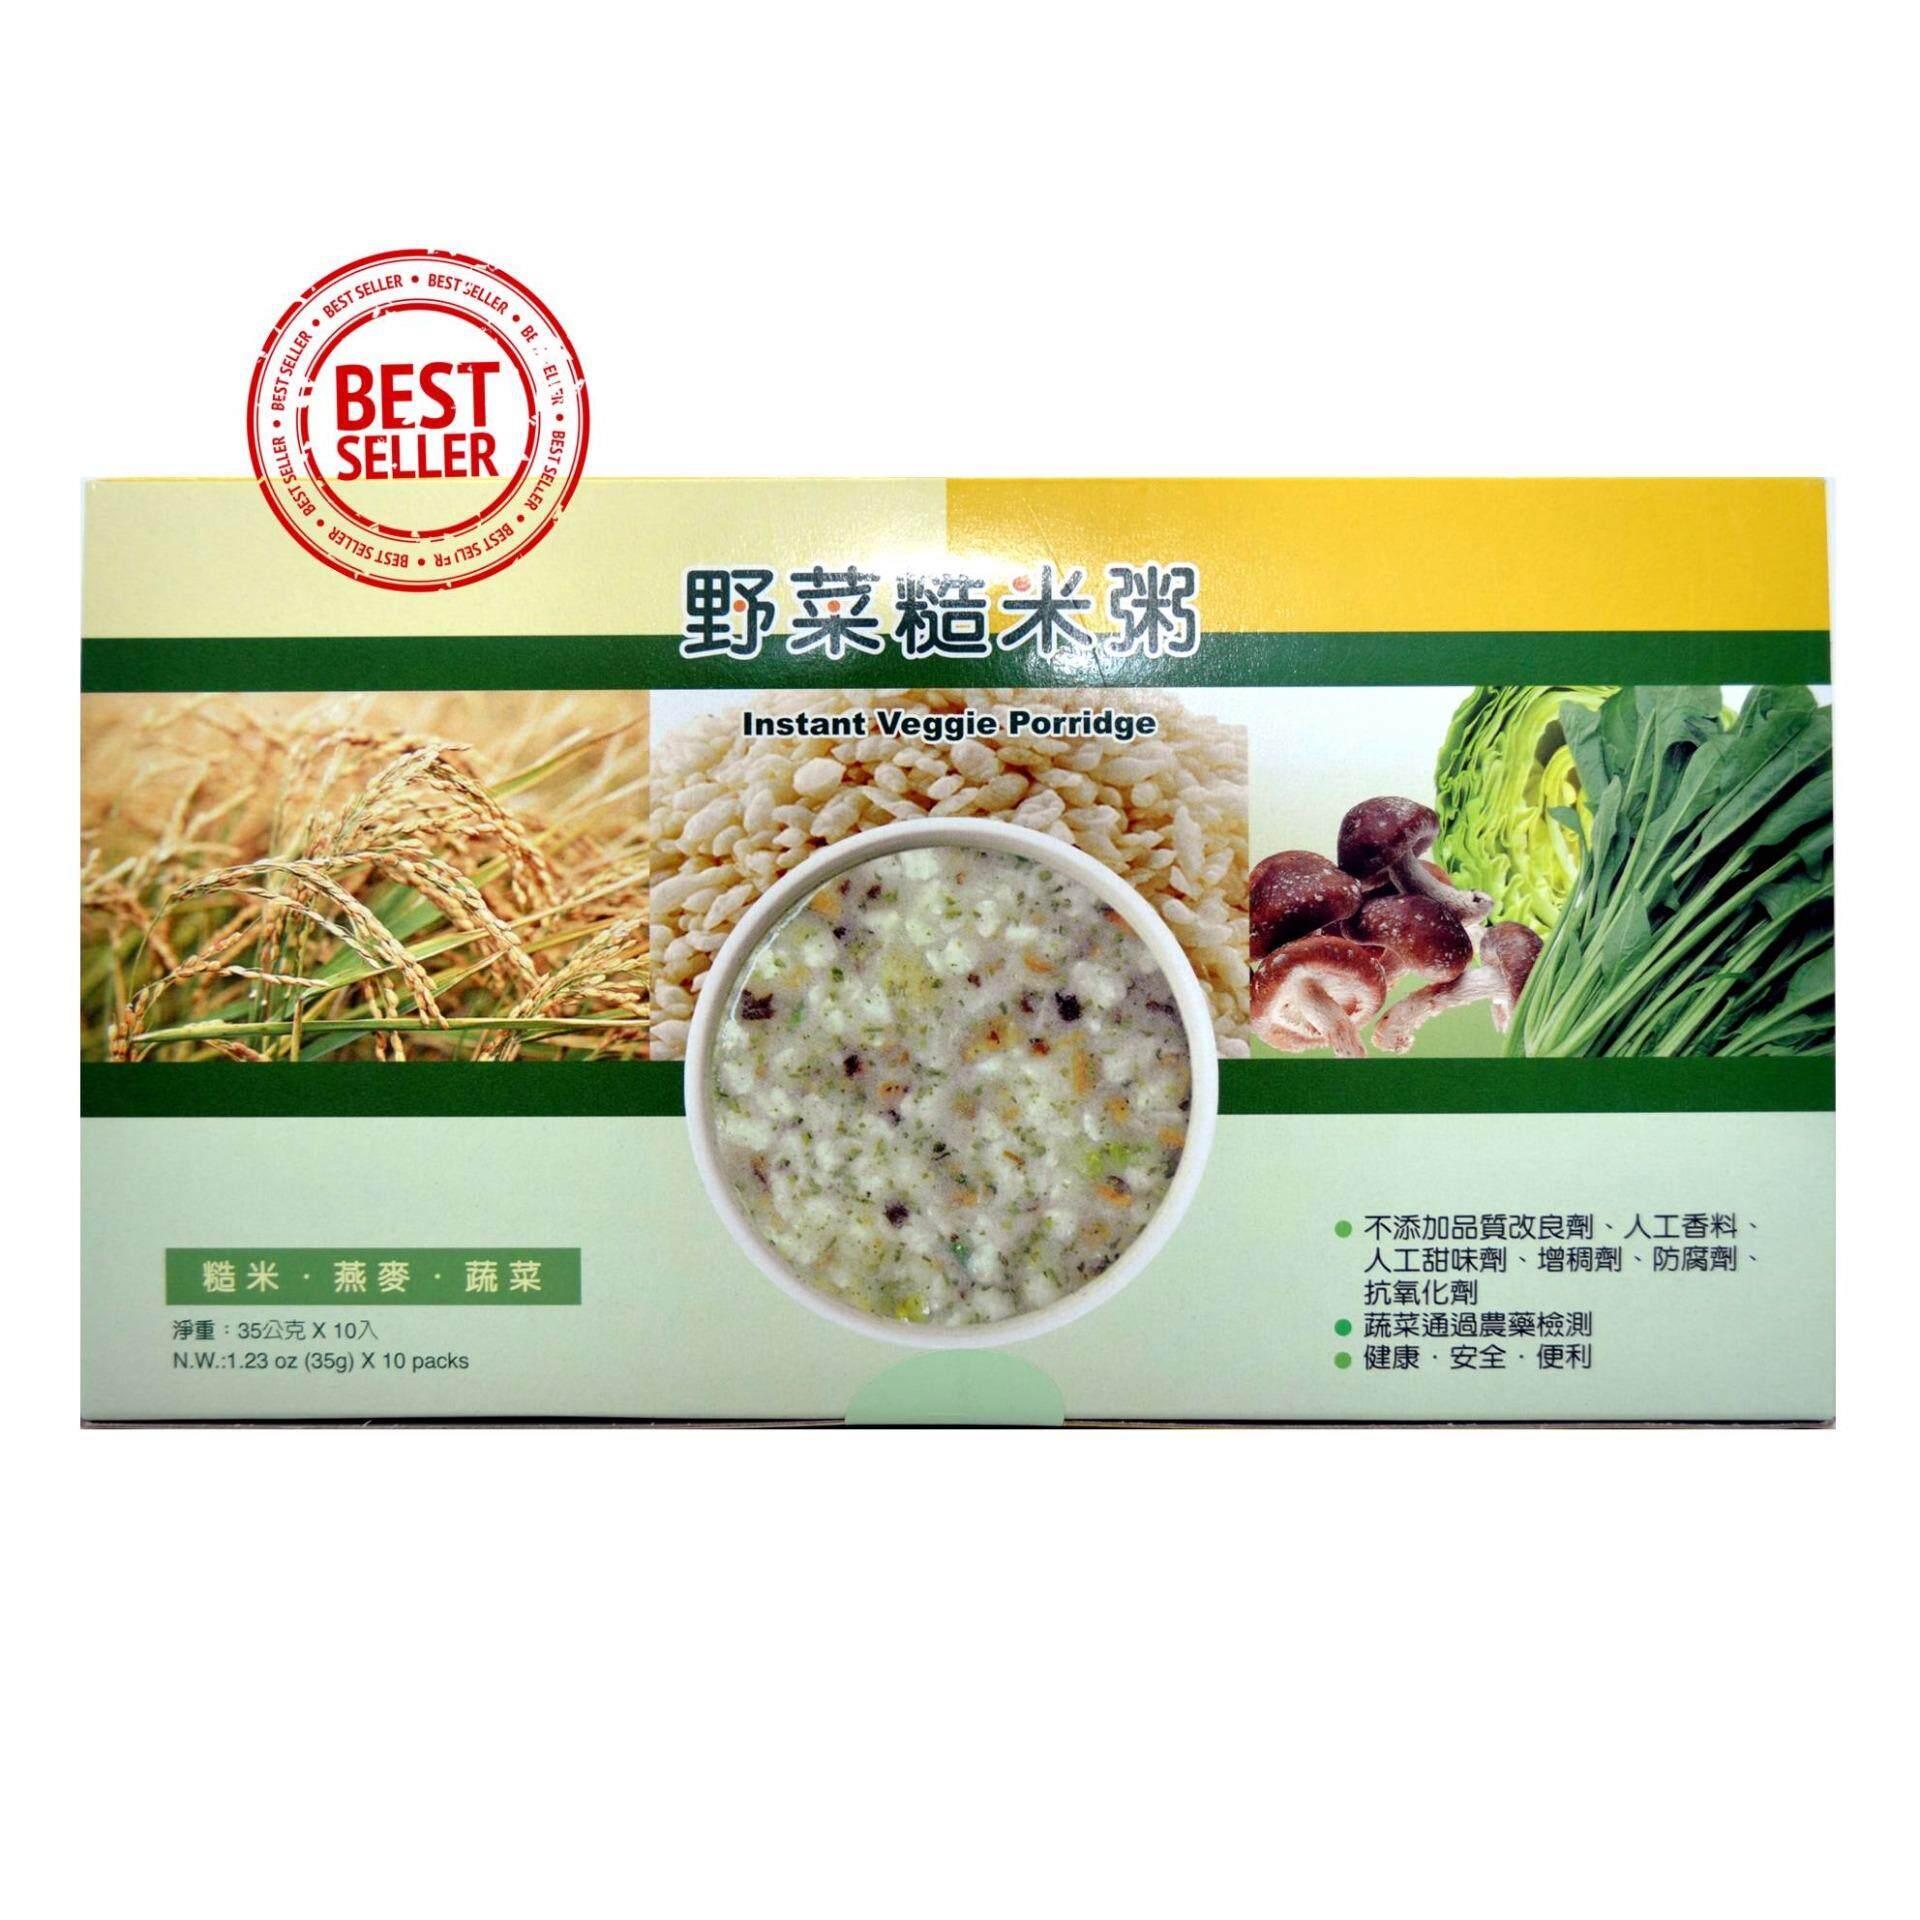 Rayma Solutions New Arrival Segotep Ramadan 3 Yes Natural Instant Veggie Porridge 350g 35g X 10 Packs